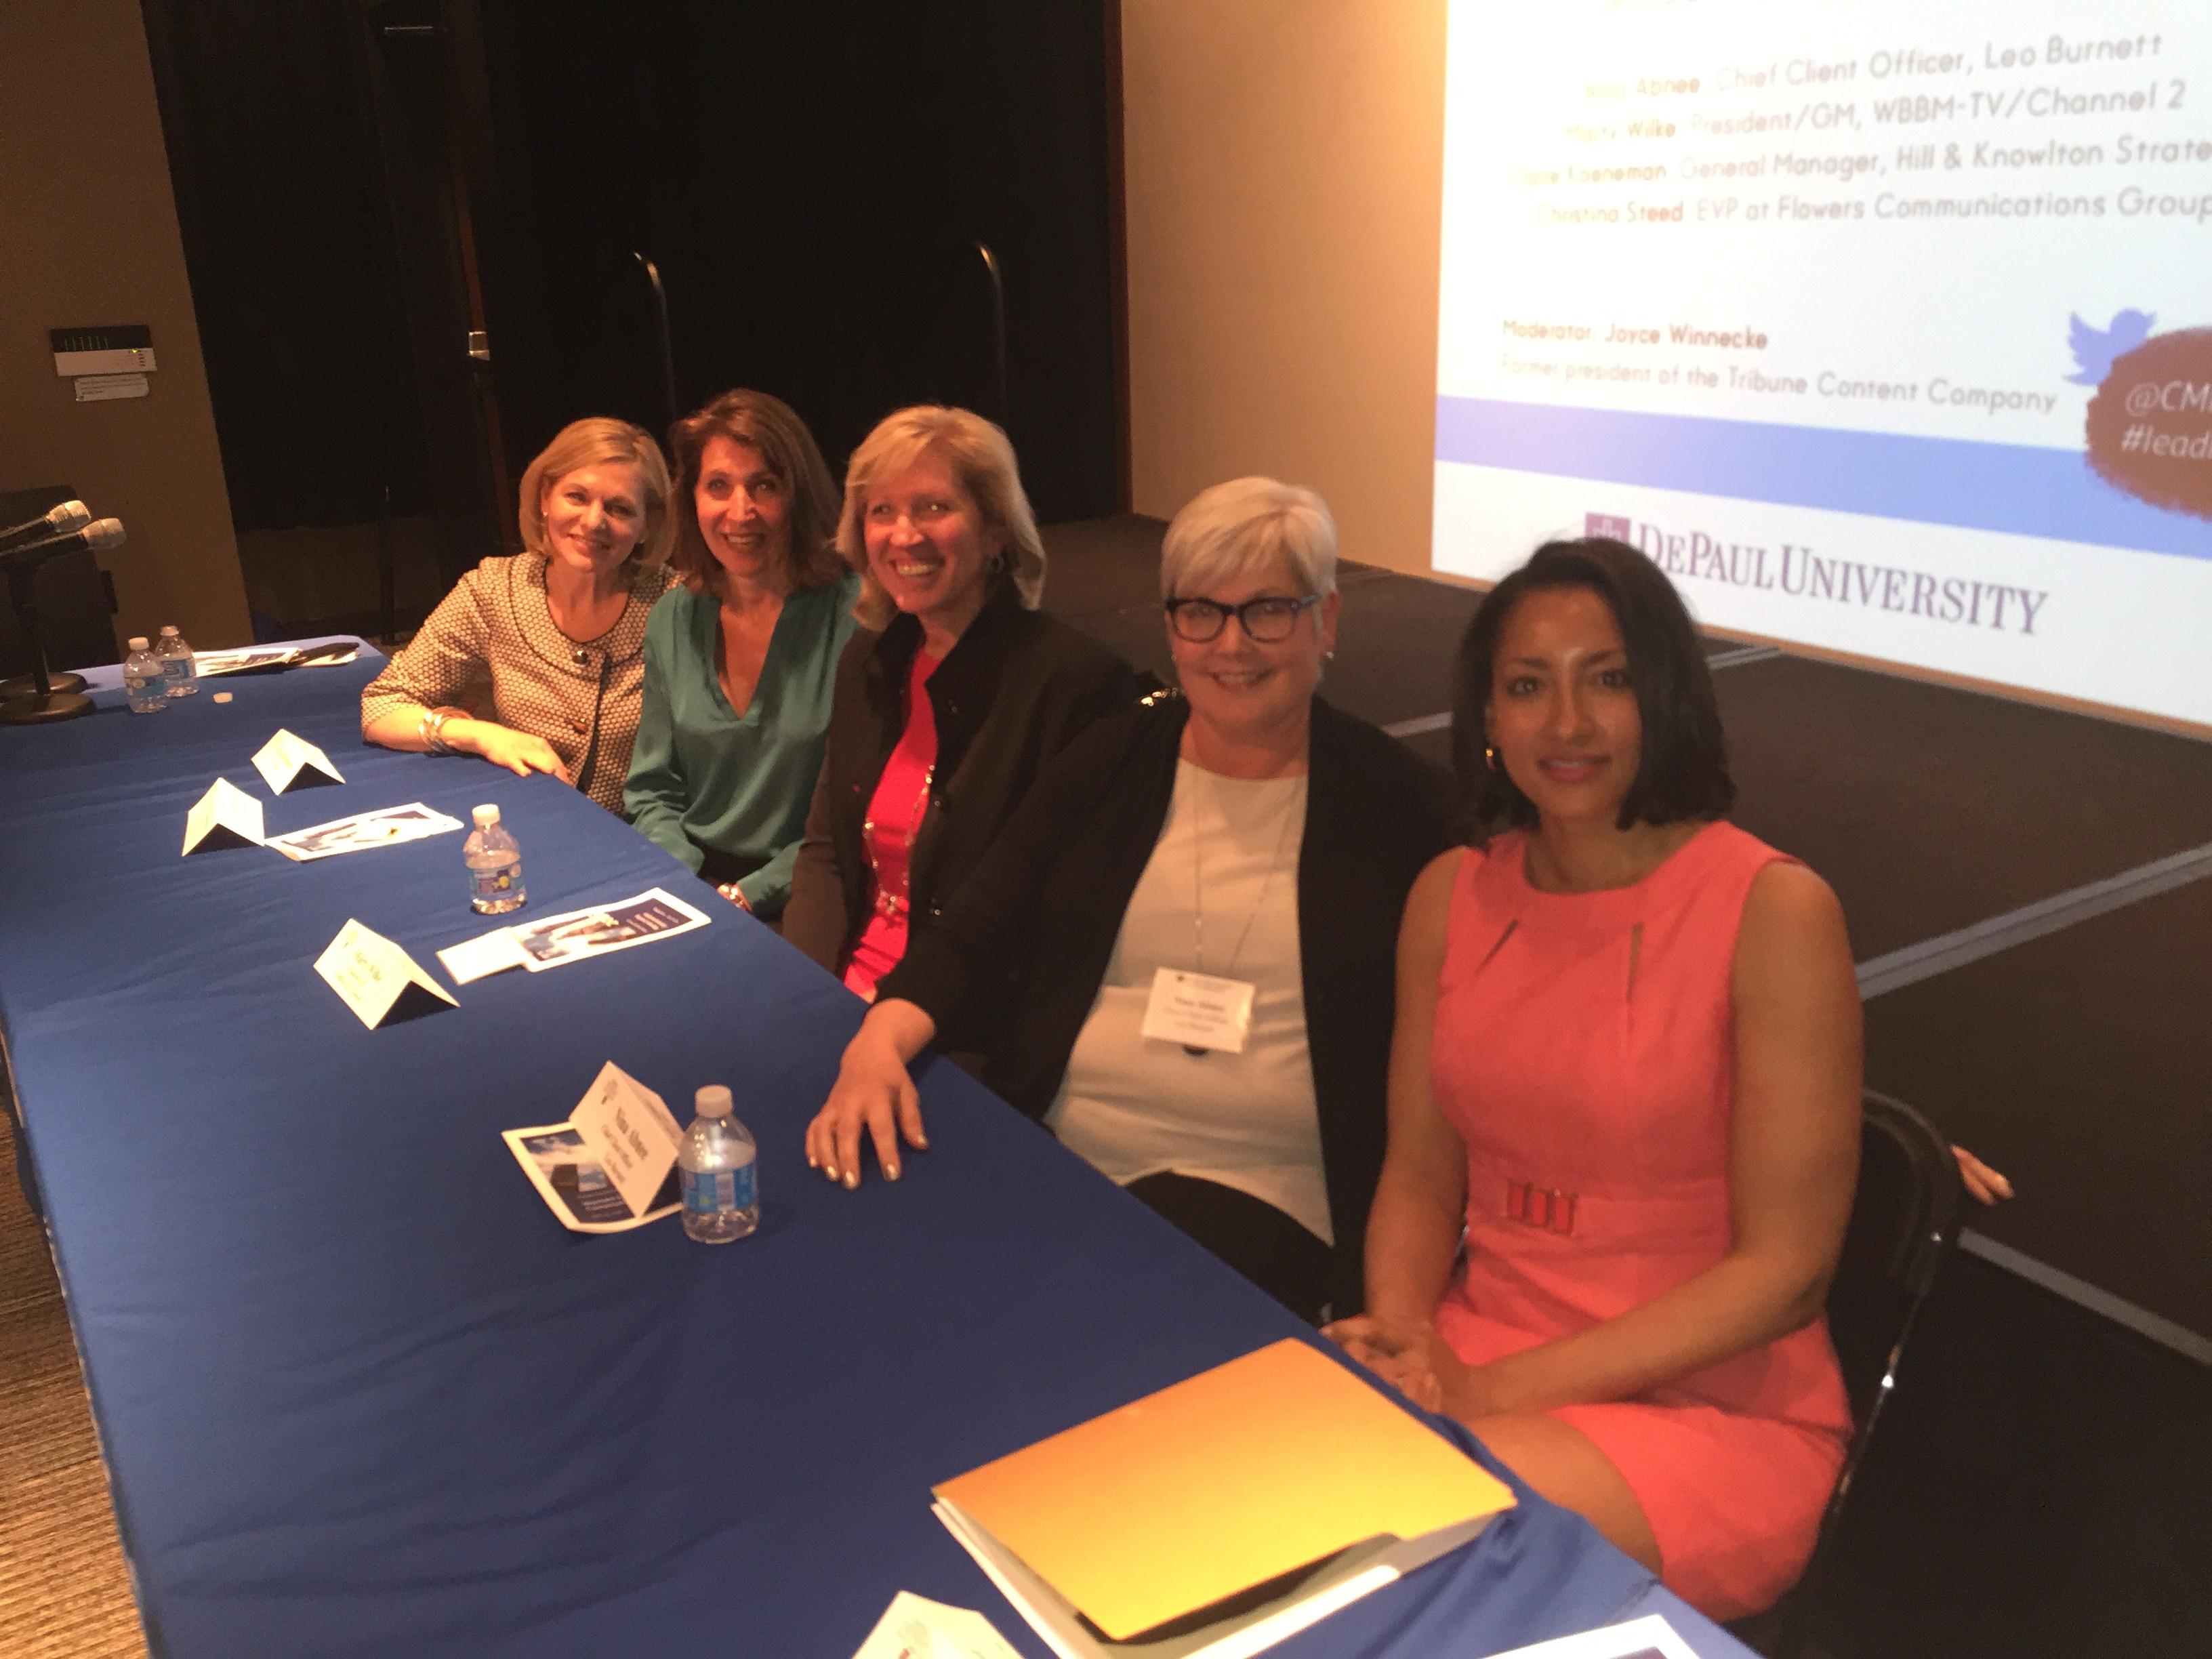 DePaul University panel Women Leading Communication